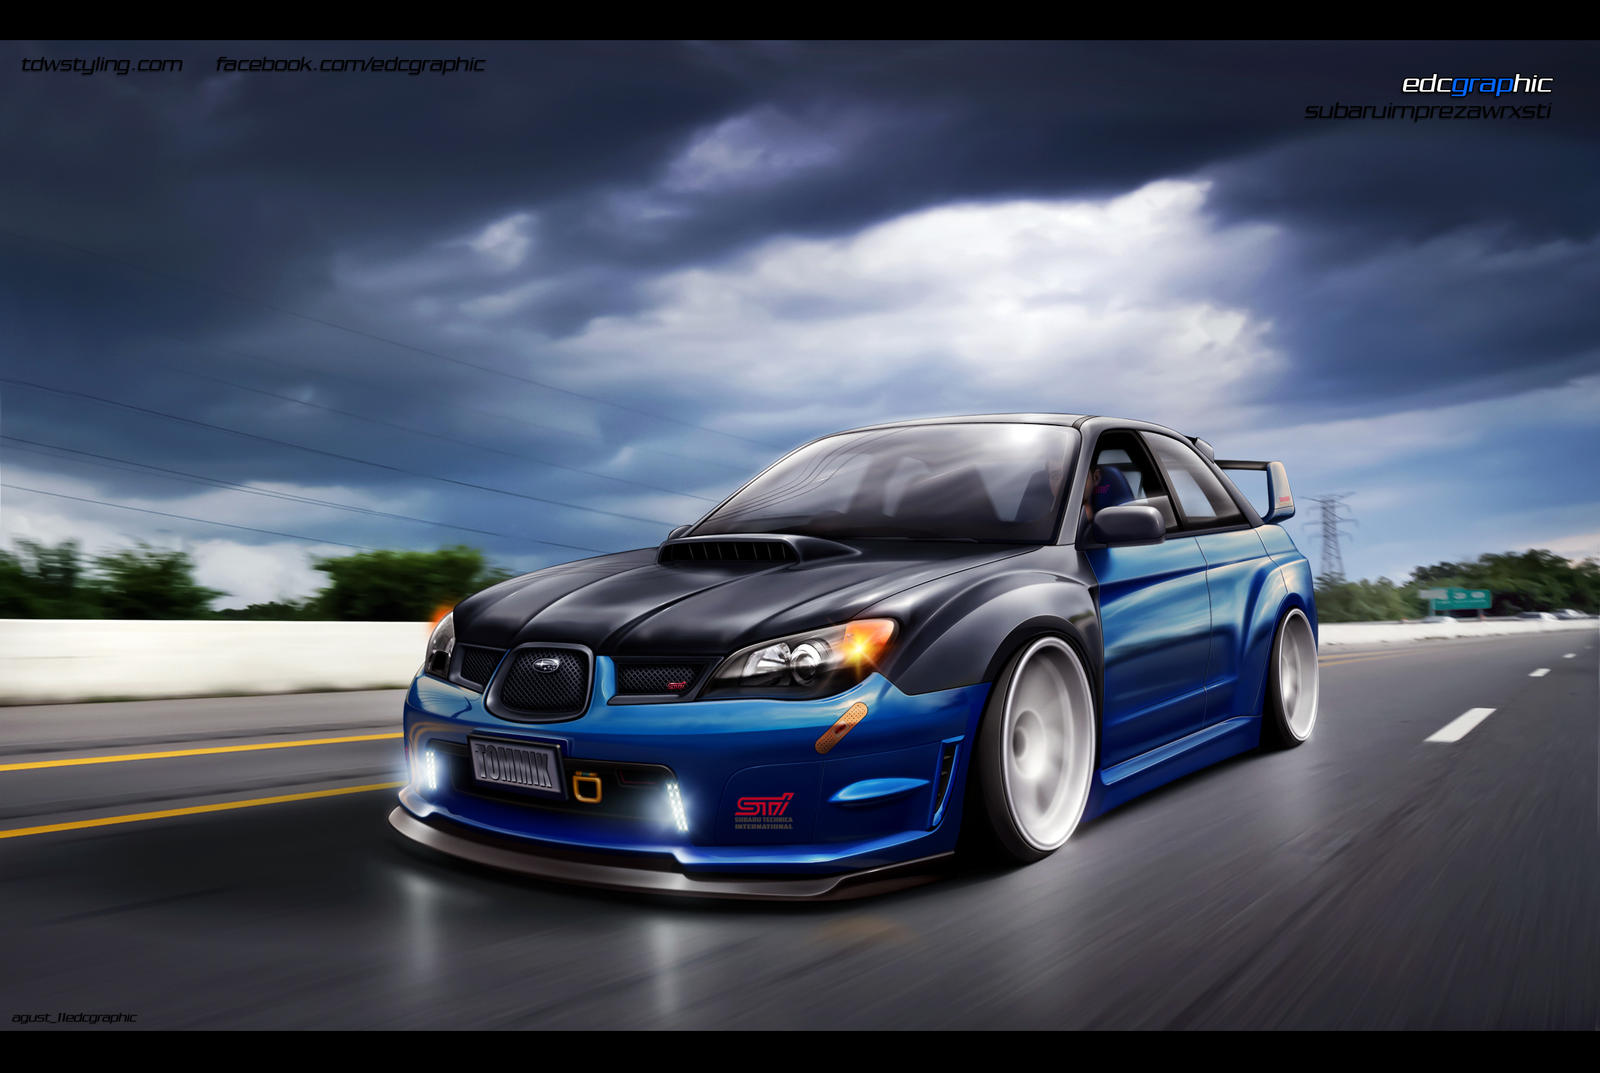 Subaru Impreza WRX STI 2 by edcgraphic